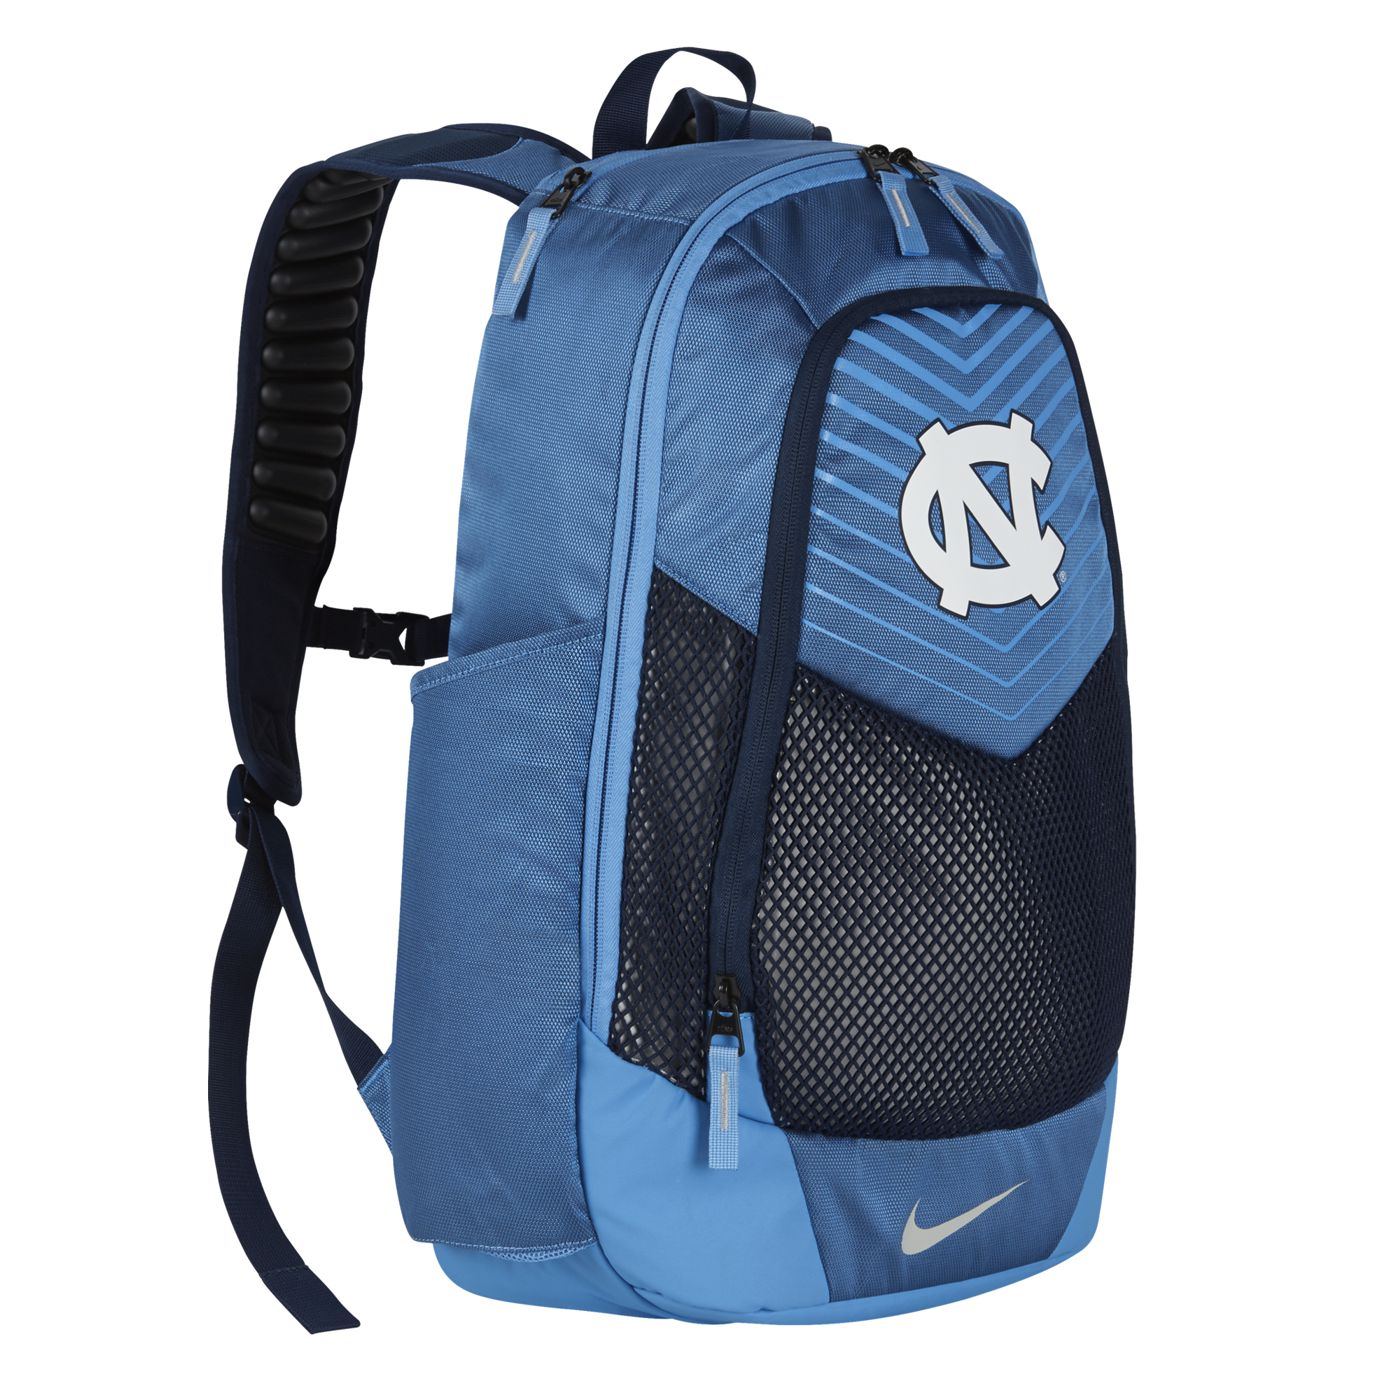 eae1b89d42464 ... bags wewillbecausewecan  large nike backpacks for school fenix toulouse  handball ...